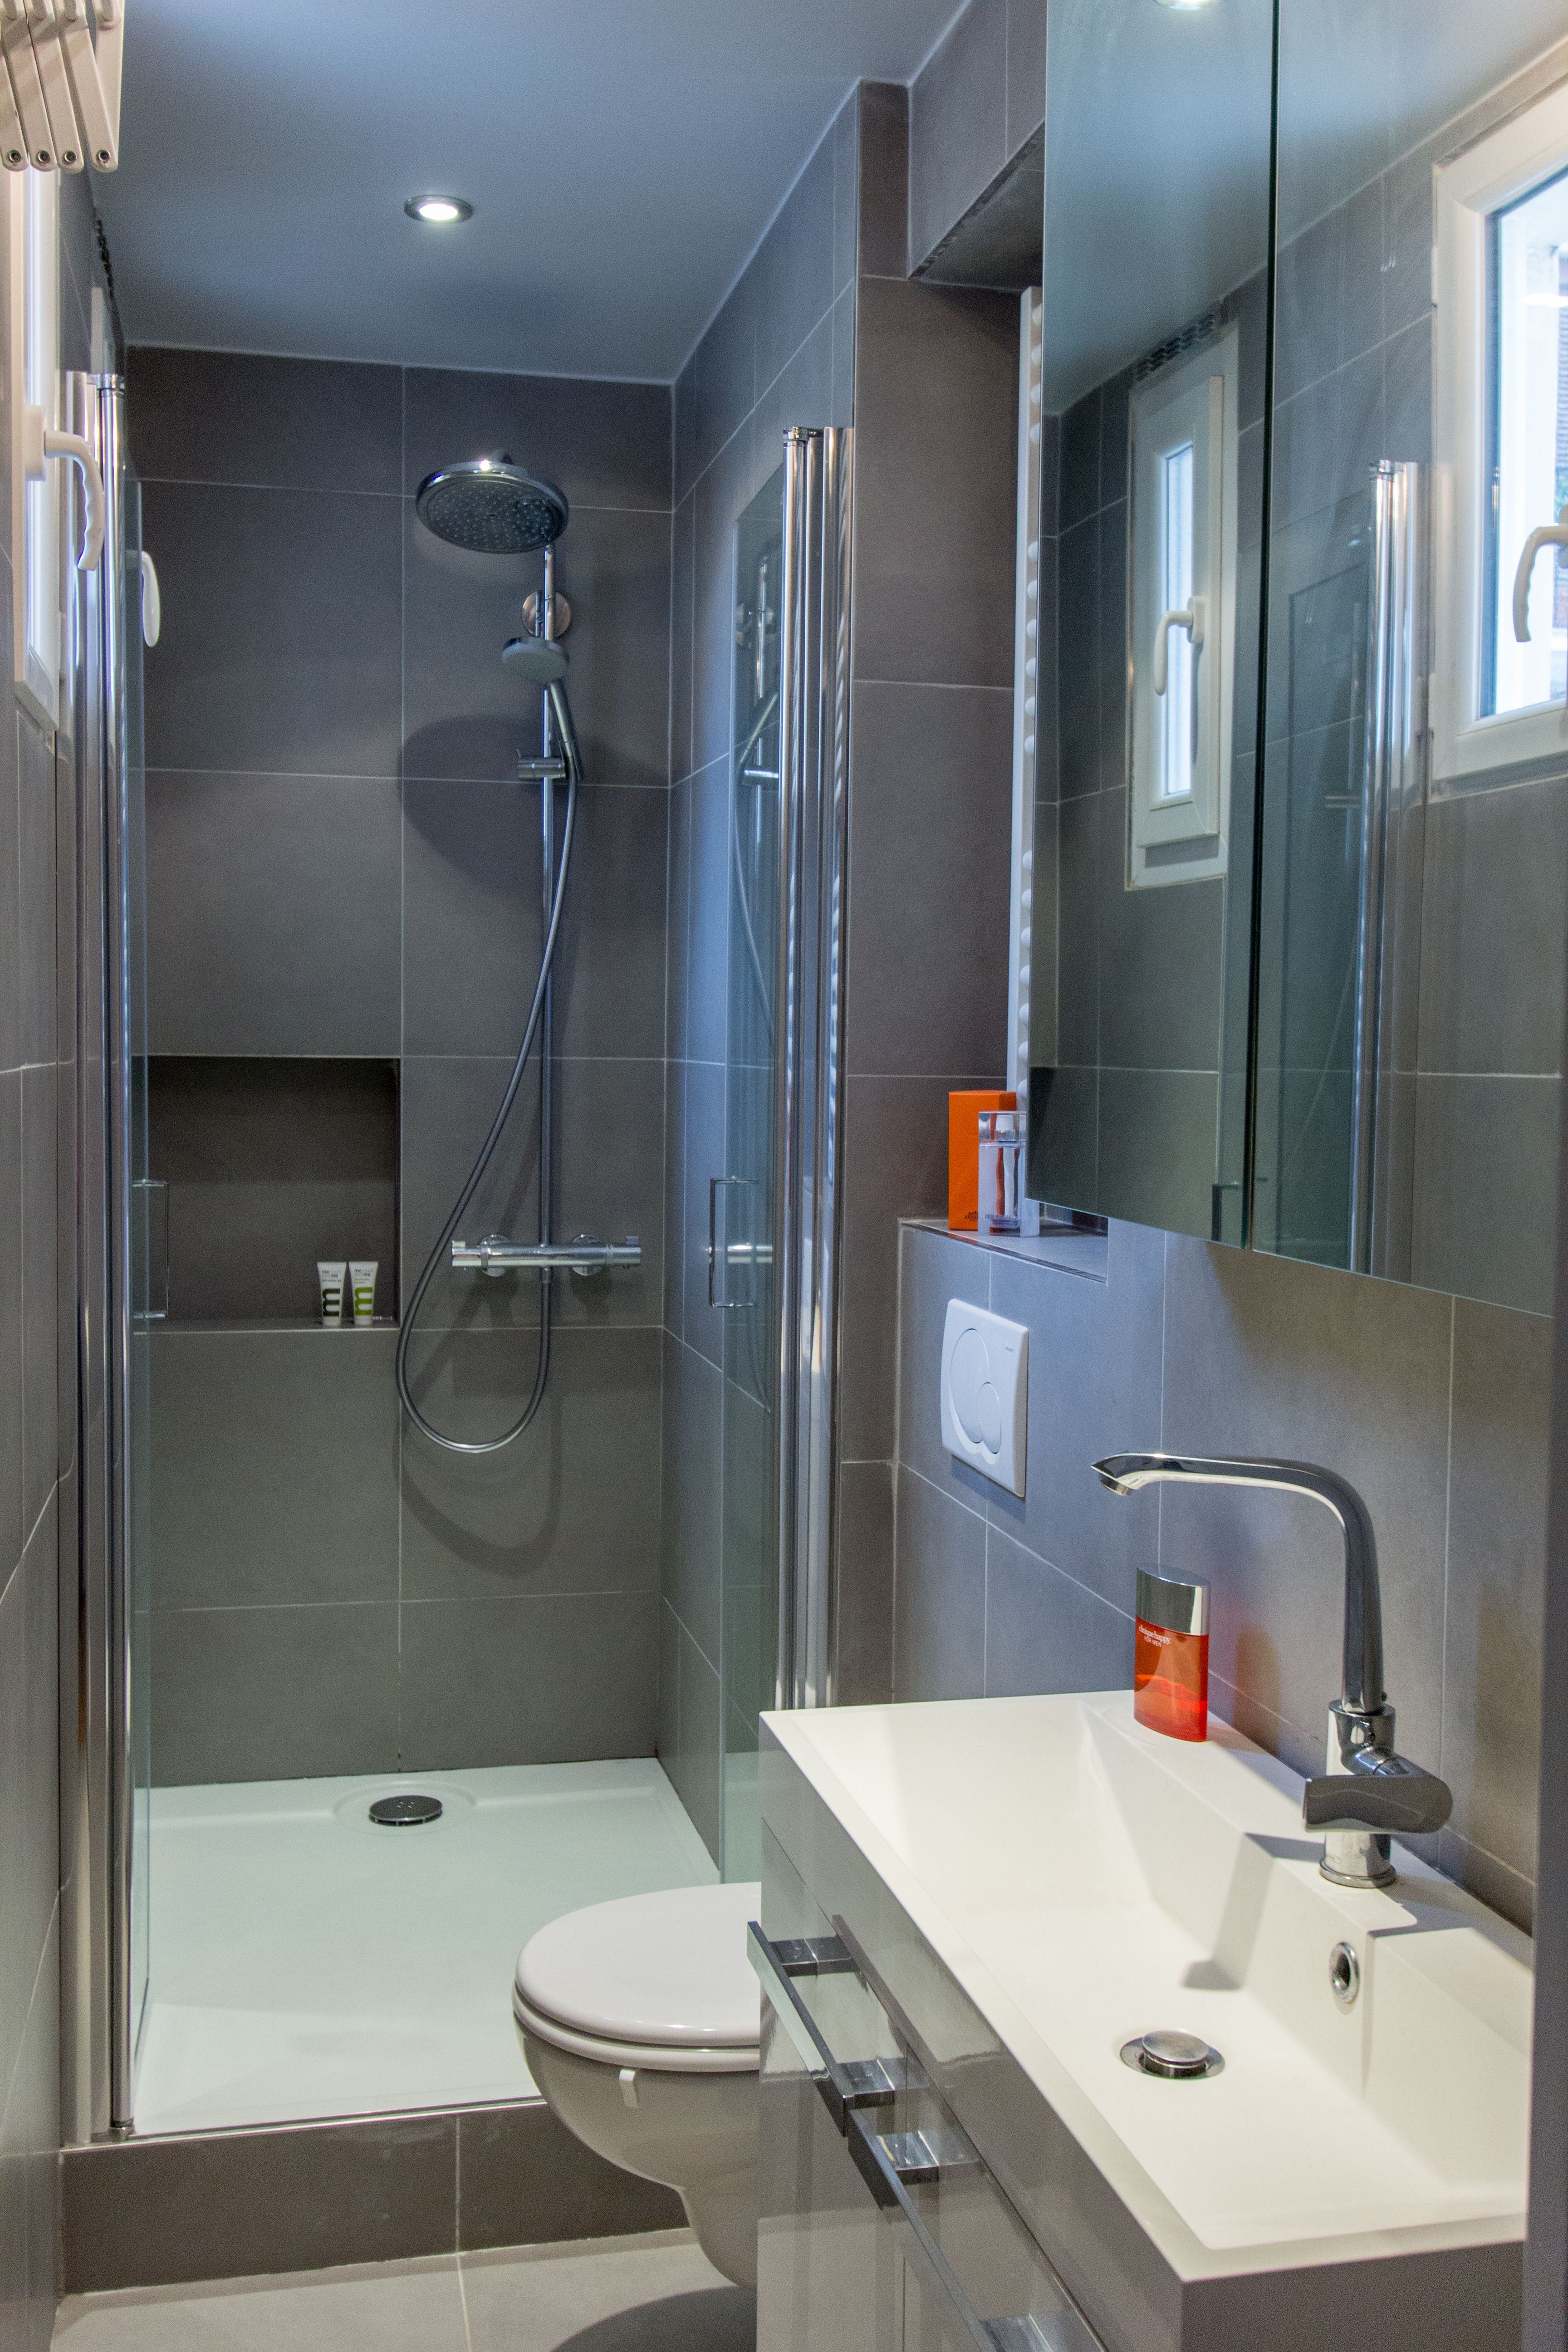 Une Petite Salle Deau Bien Pens E Bathroom Remodelingbathroom Ideassmall